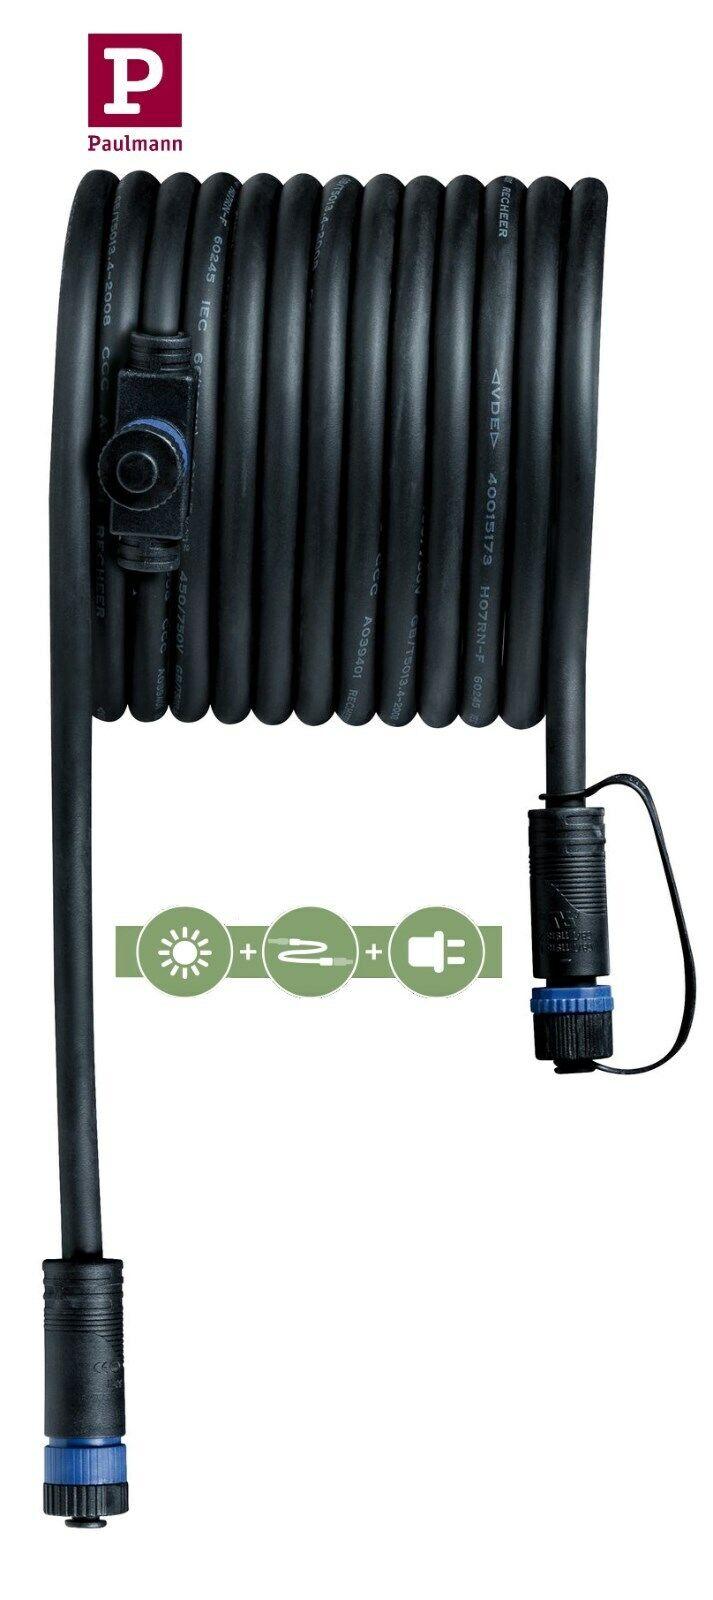 Trafo und Kabel Paulmann Plug /& Shine Basisset Erdspieß Pike IP65 3x3,5W inkl